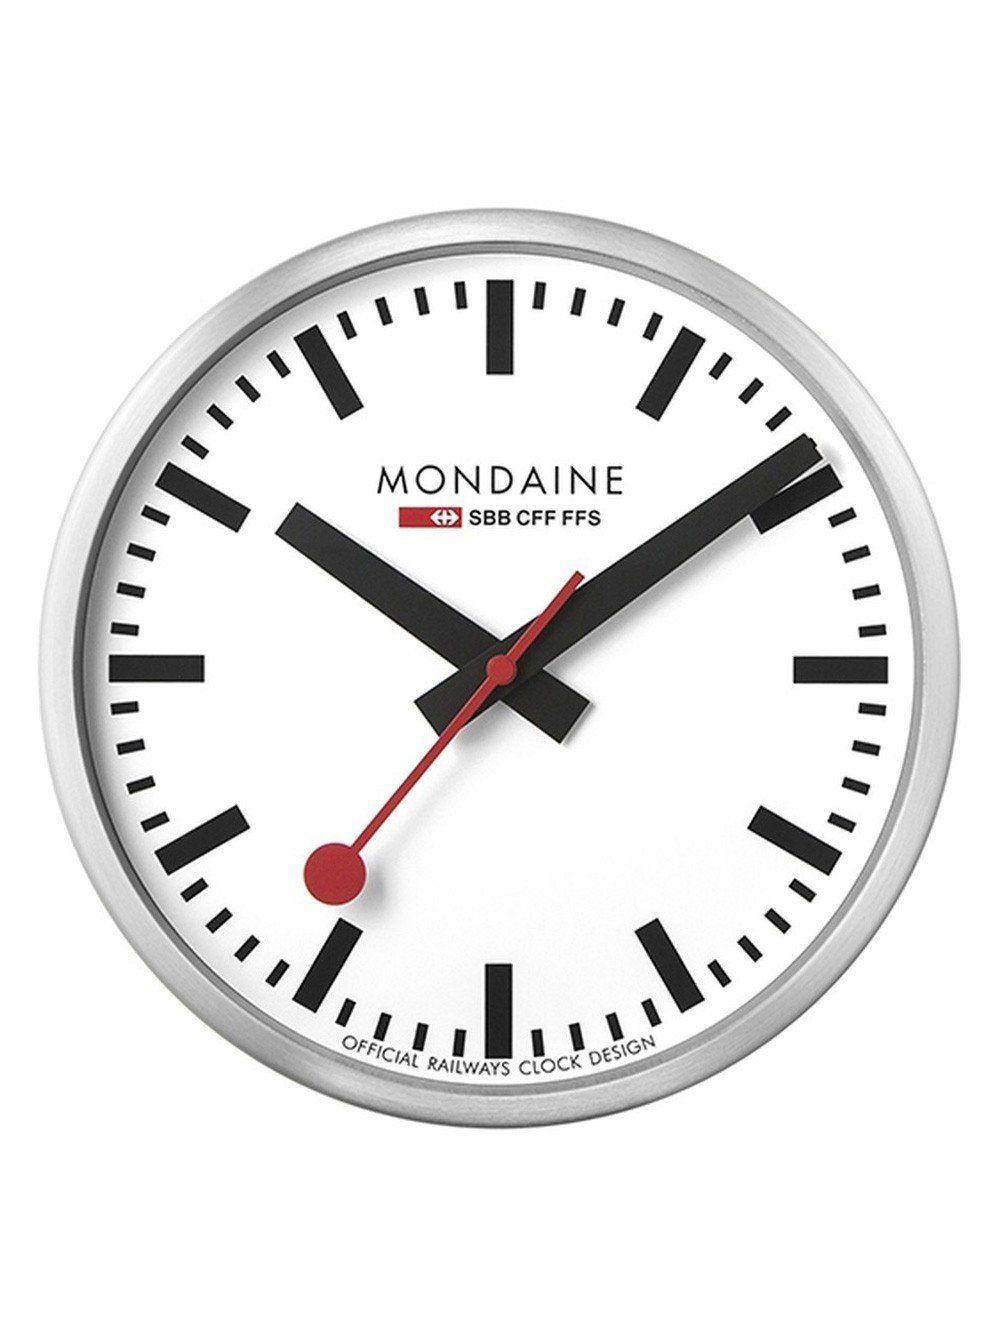 Mondaine Msm 25s10 Stop2go Wanduhr Silber O 25 Cm Swiss Railway Wall Clock Mondaine Wall Clock Wall Clock